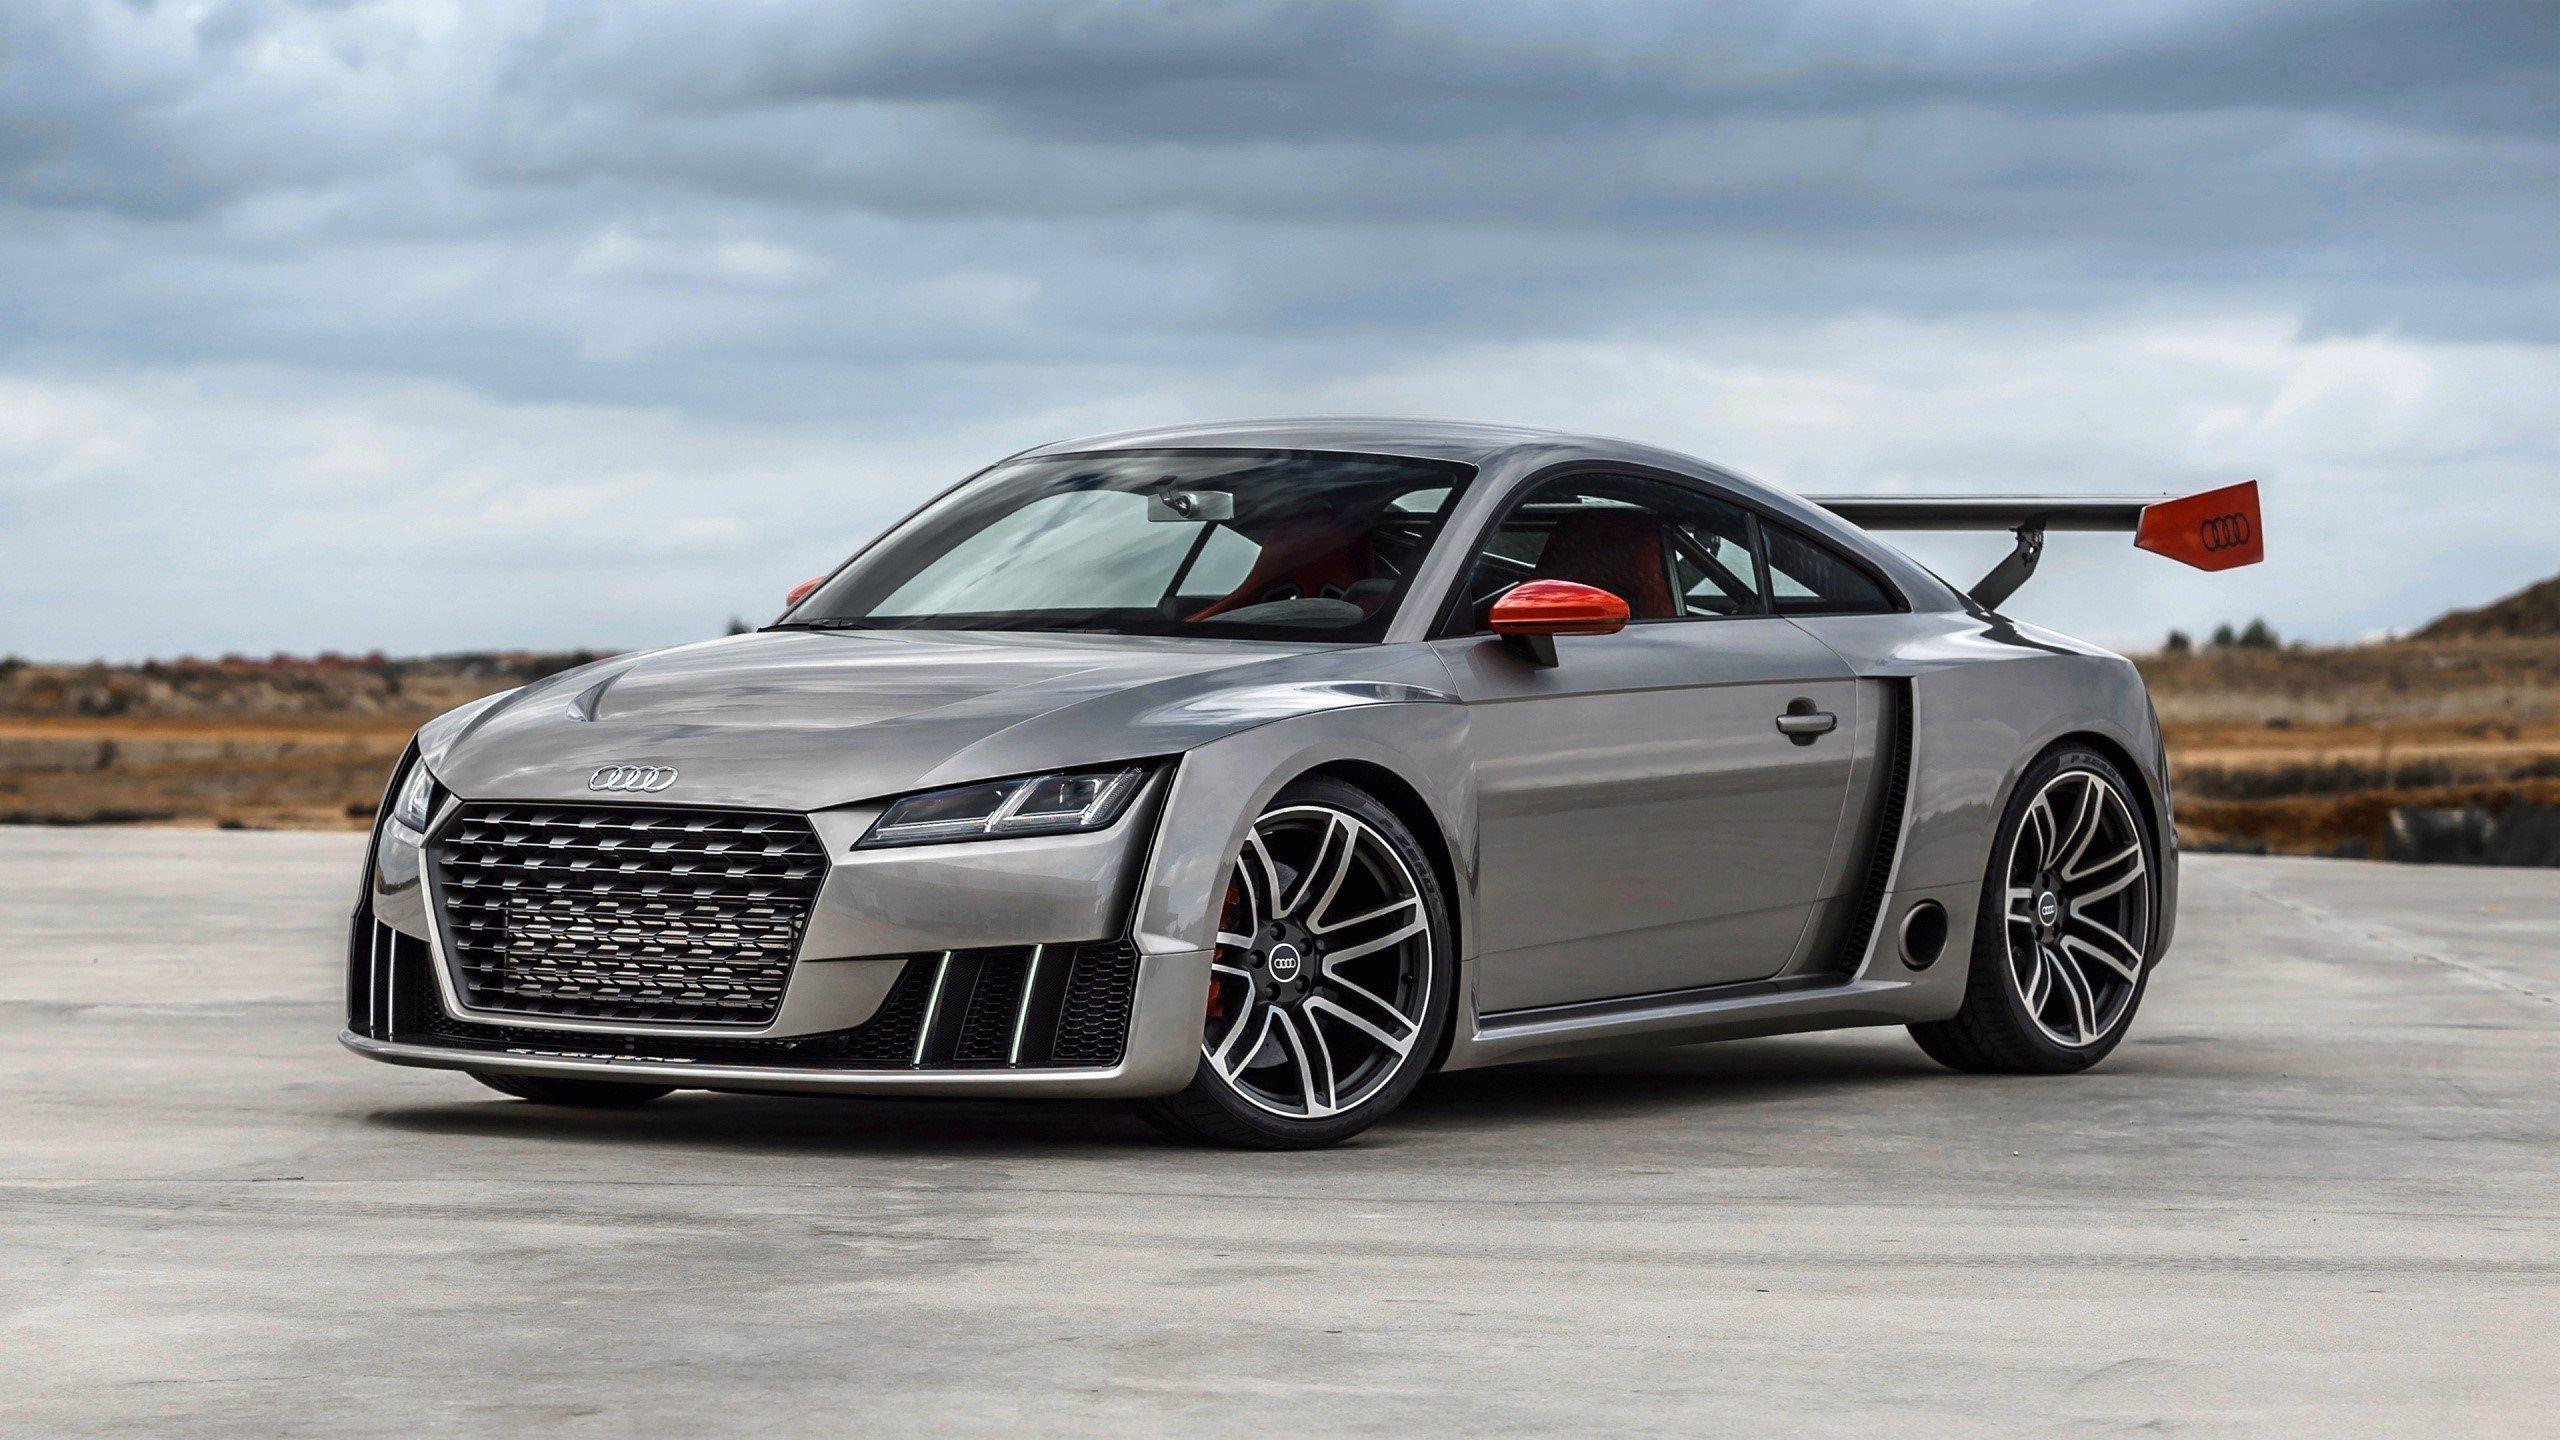 Fondos de pantalla Audi TT Coupe Concept